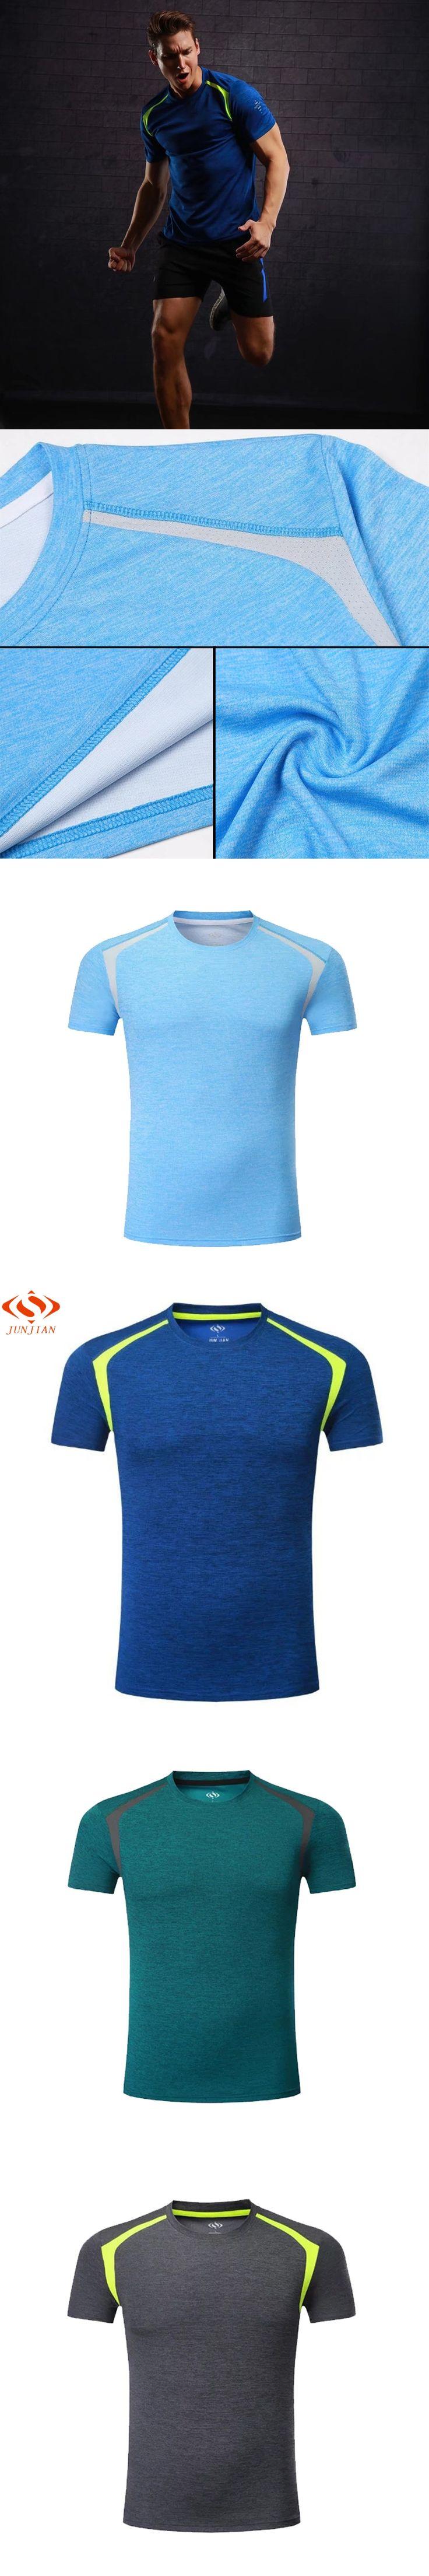 2017 Short Sleeve Survetement Men's Sport Running Shirt Quick Dry Basketball Soccer Training T Shirt Men Gym Clothing Sportswear